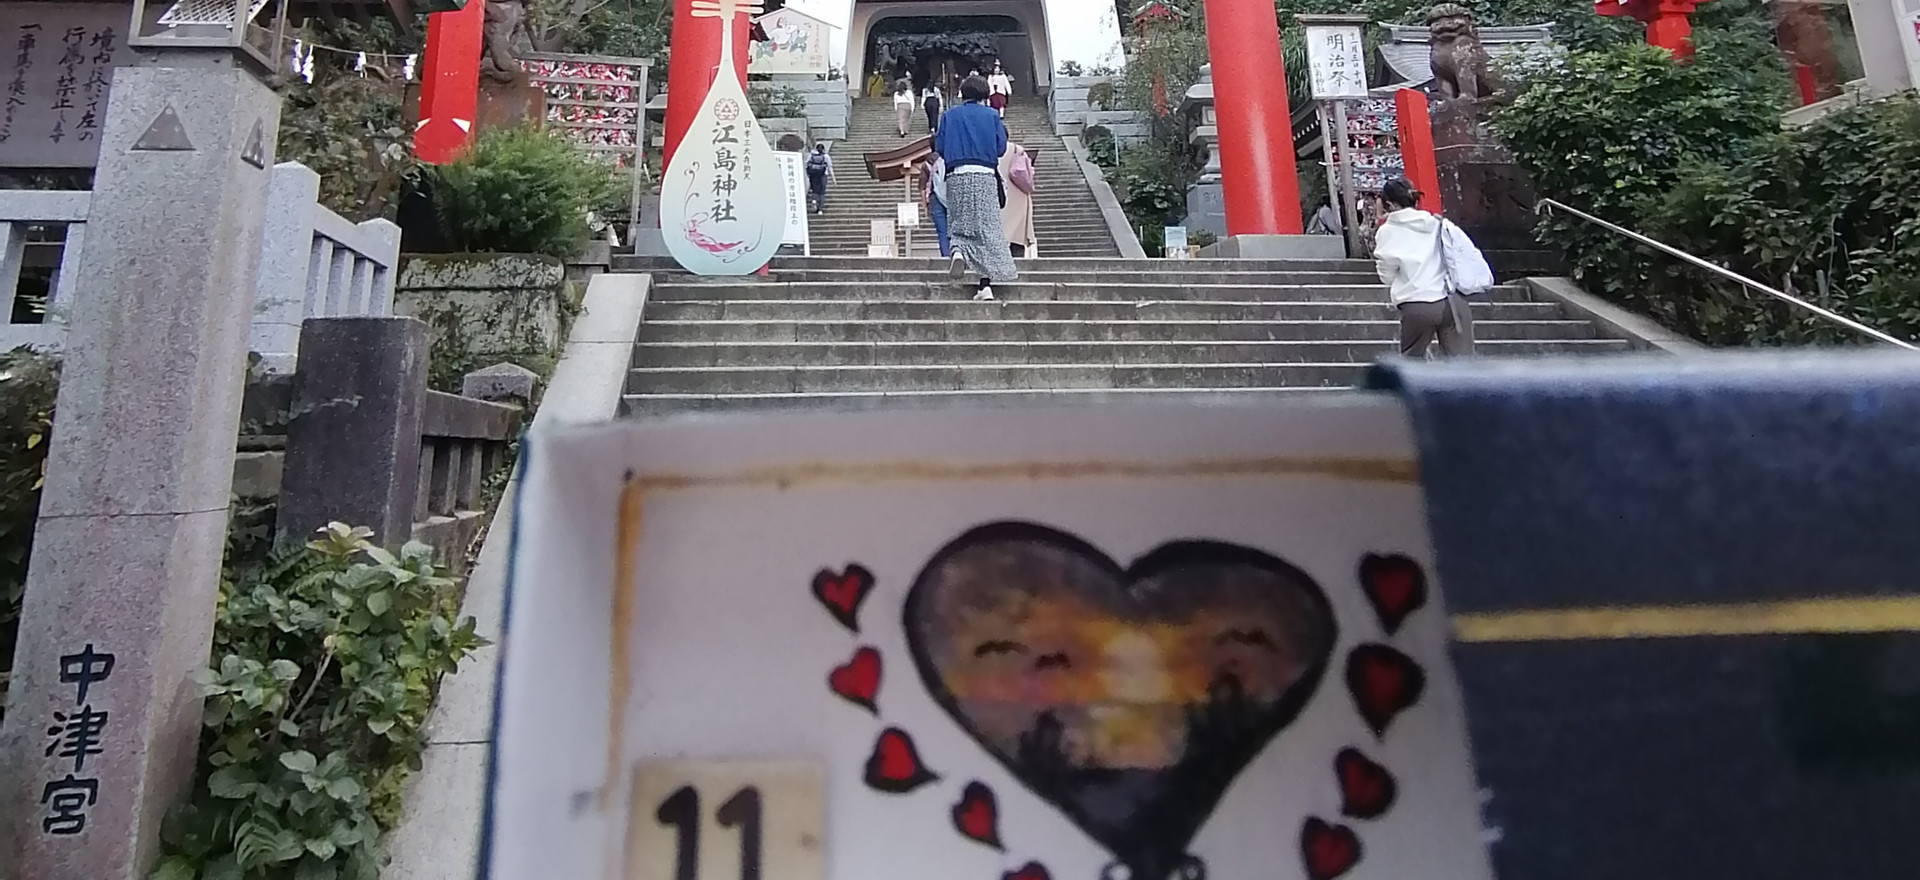 """October day 26 Enoshima Shrine 2-3 Enoshima, Fujisawa City, Kanagawa Prefecture 251-0036"" – Aya"